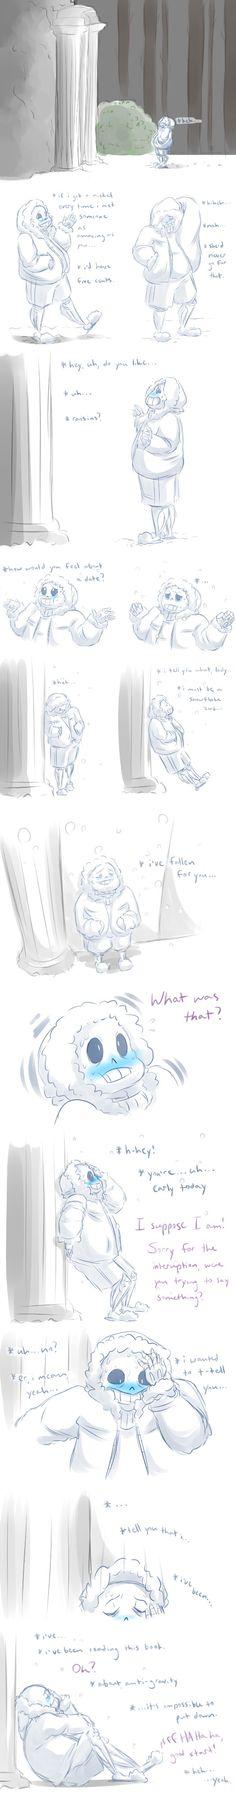 Sans and Toriel - comic - http://mod2amaryllis.tumblr.com/post/132920743022/someone-put-out-the-idea-that-sans-would-practice